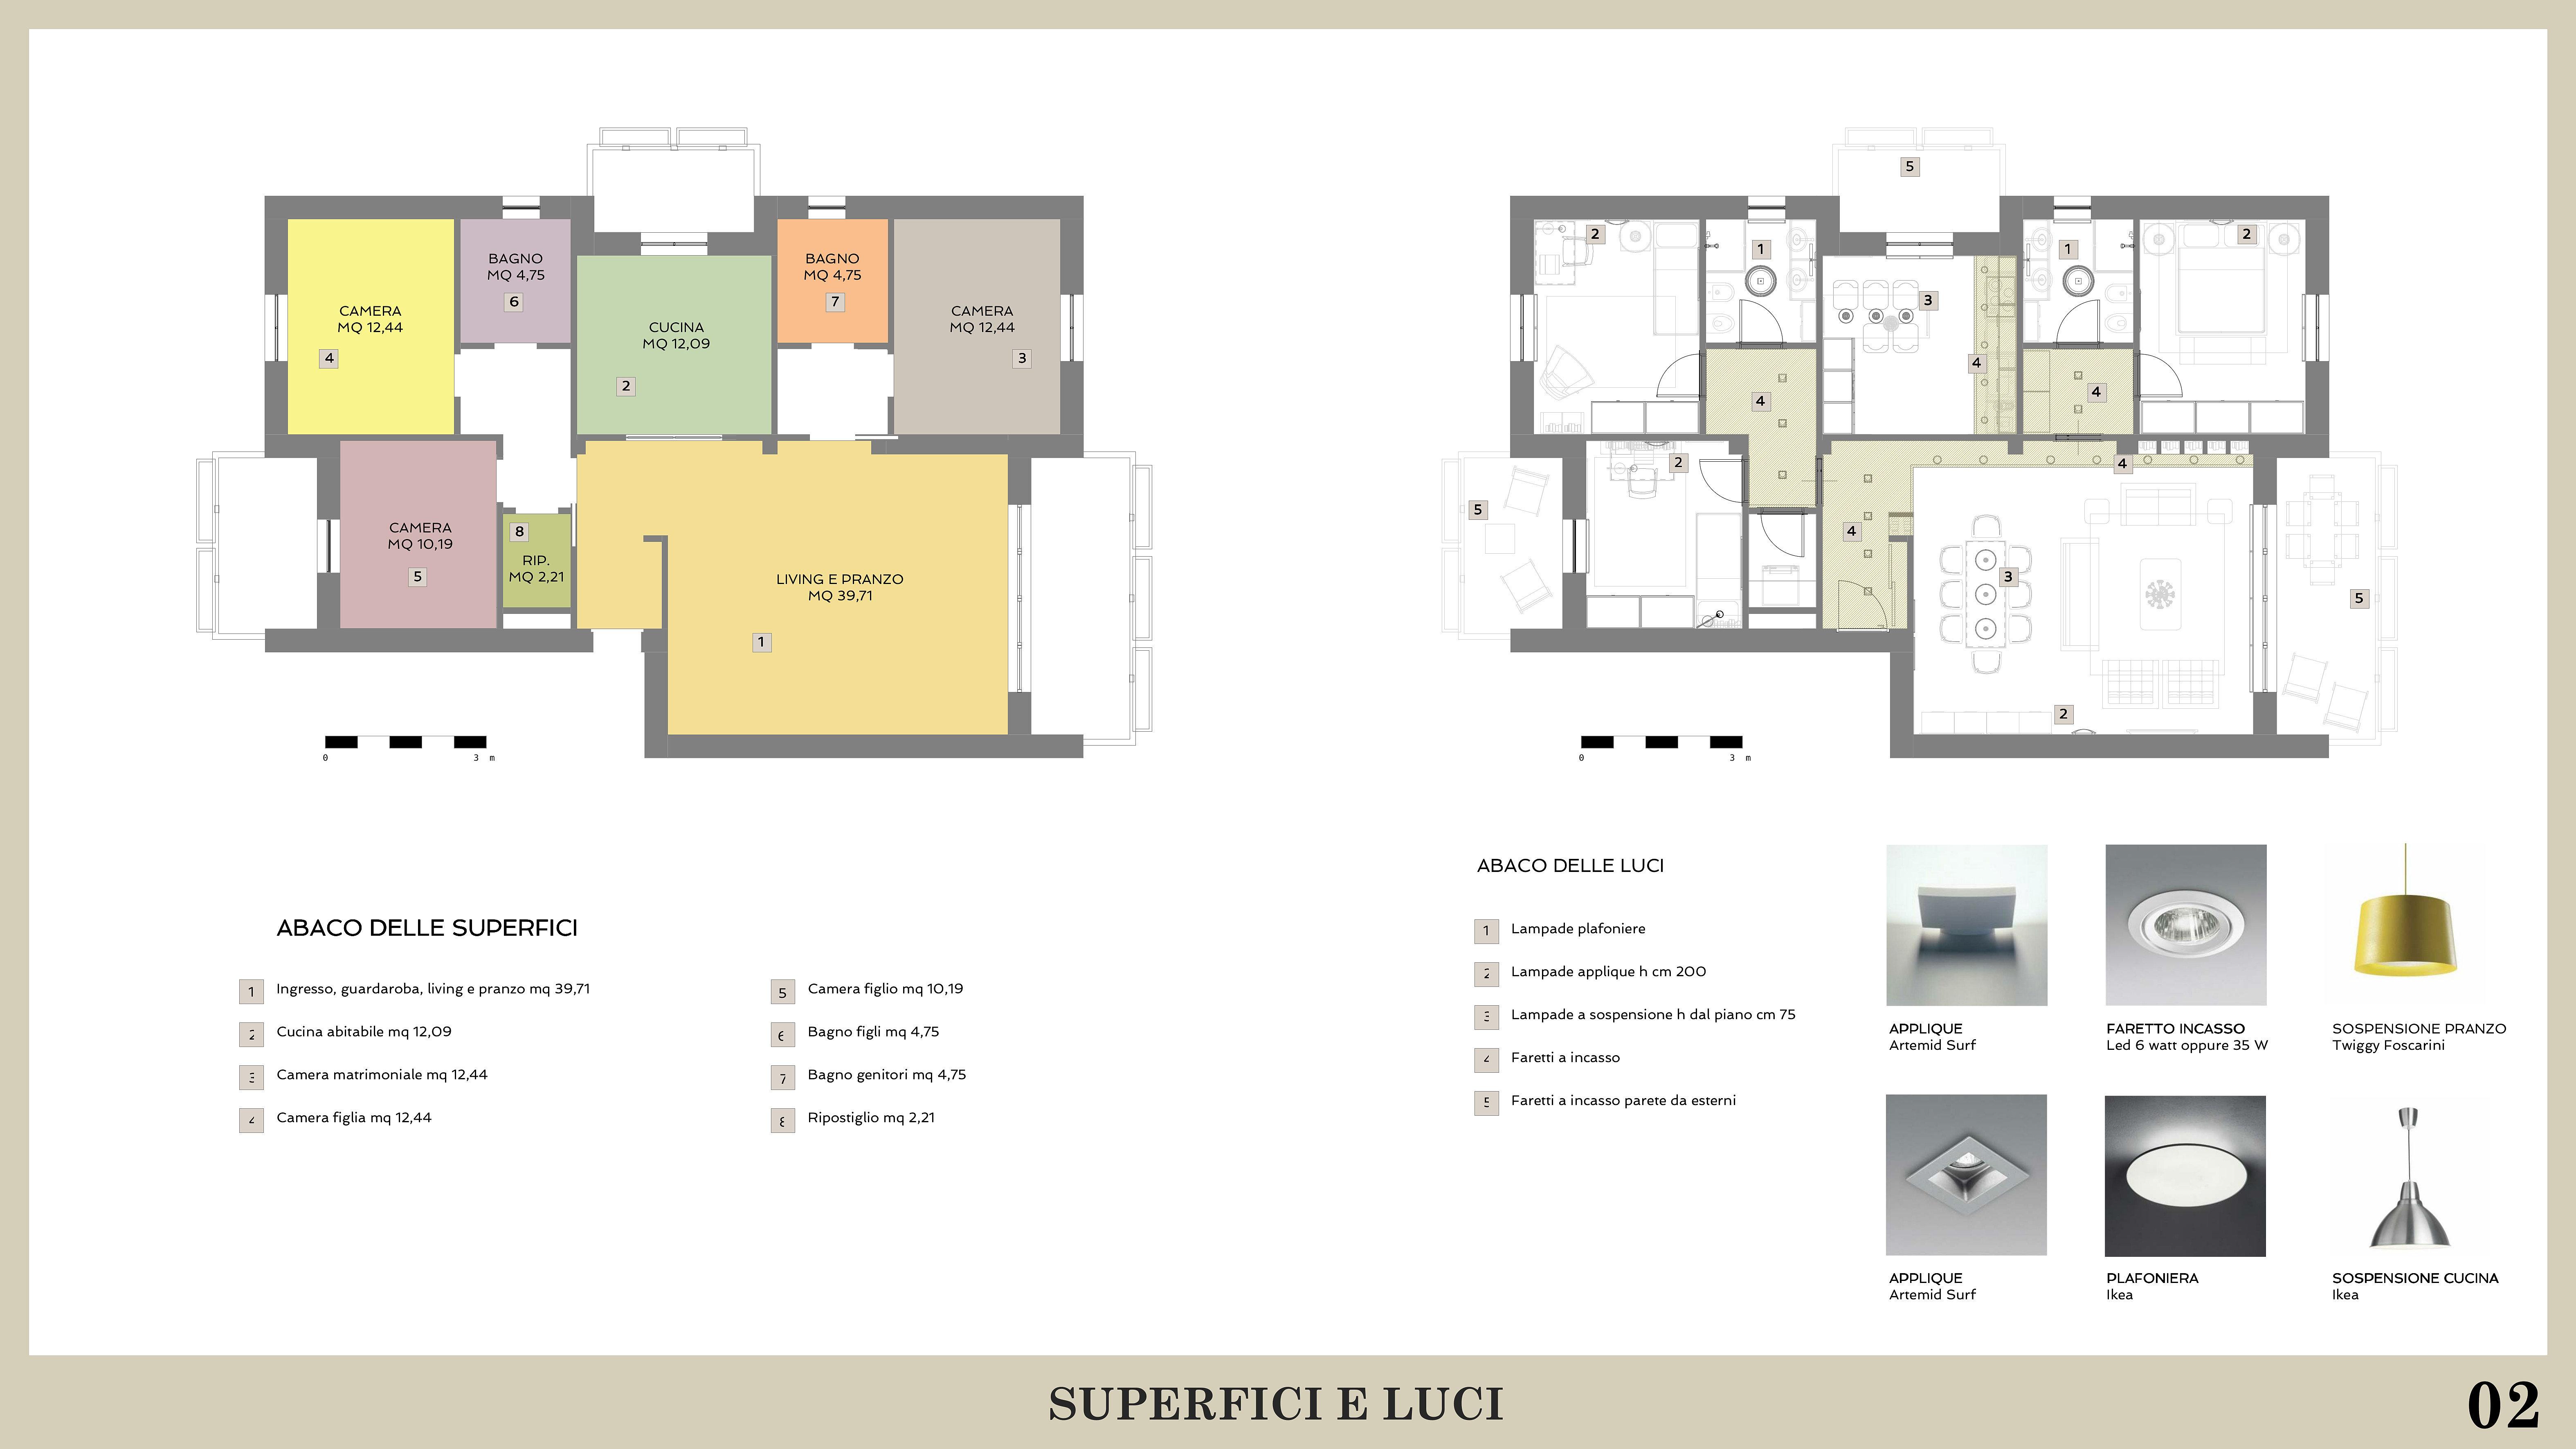 Progettare stanza online amazing cool sweet home d for Progettare cameretta online gratis